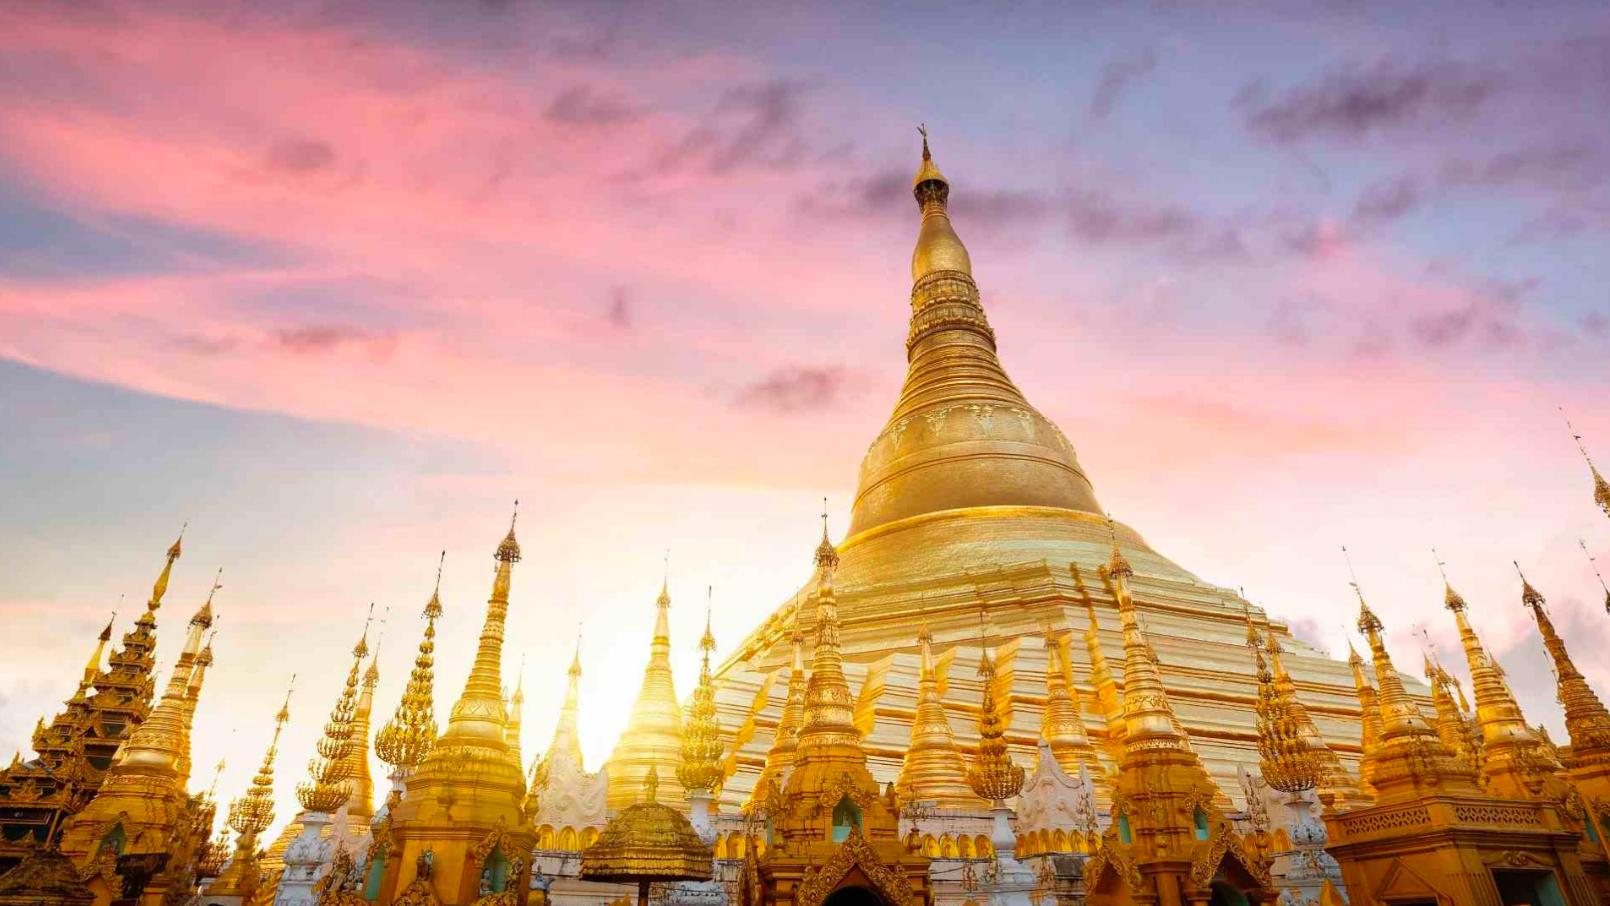 China-Myanmar 'Paukphaw' (fraternal) friendship gaining vitality